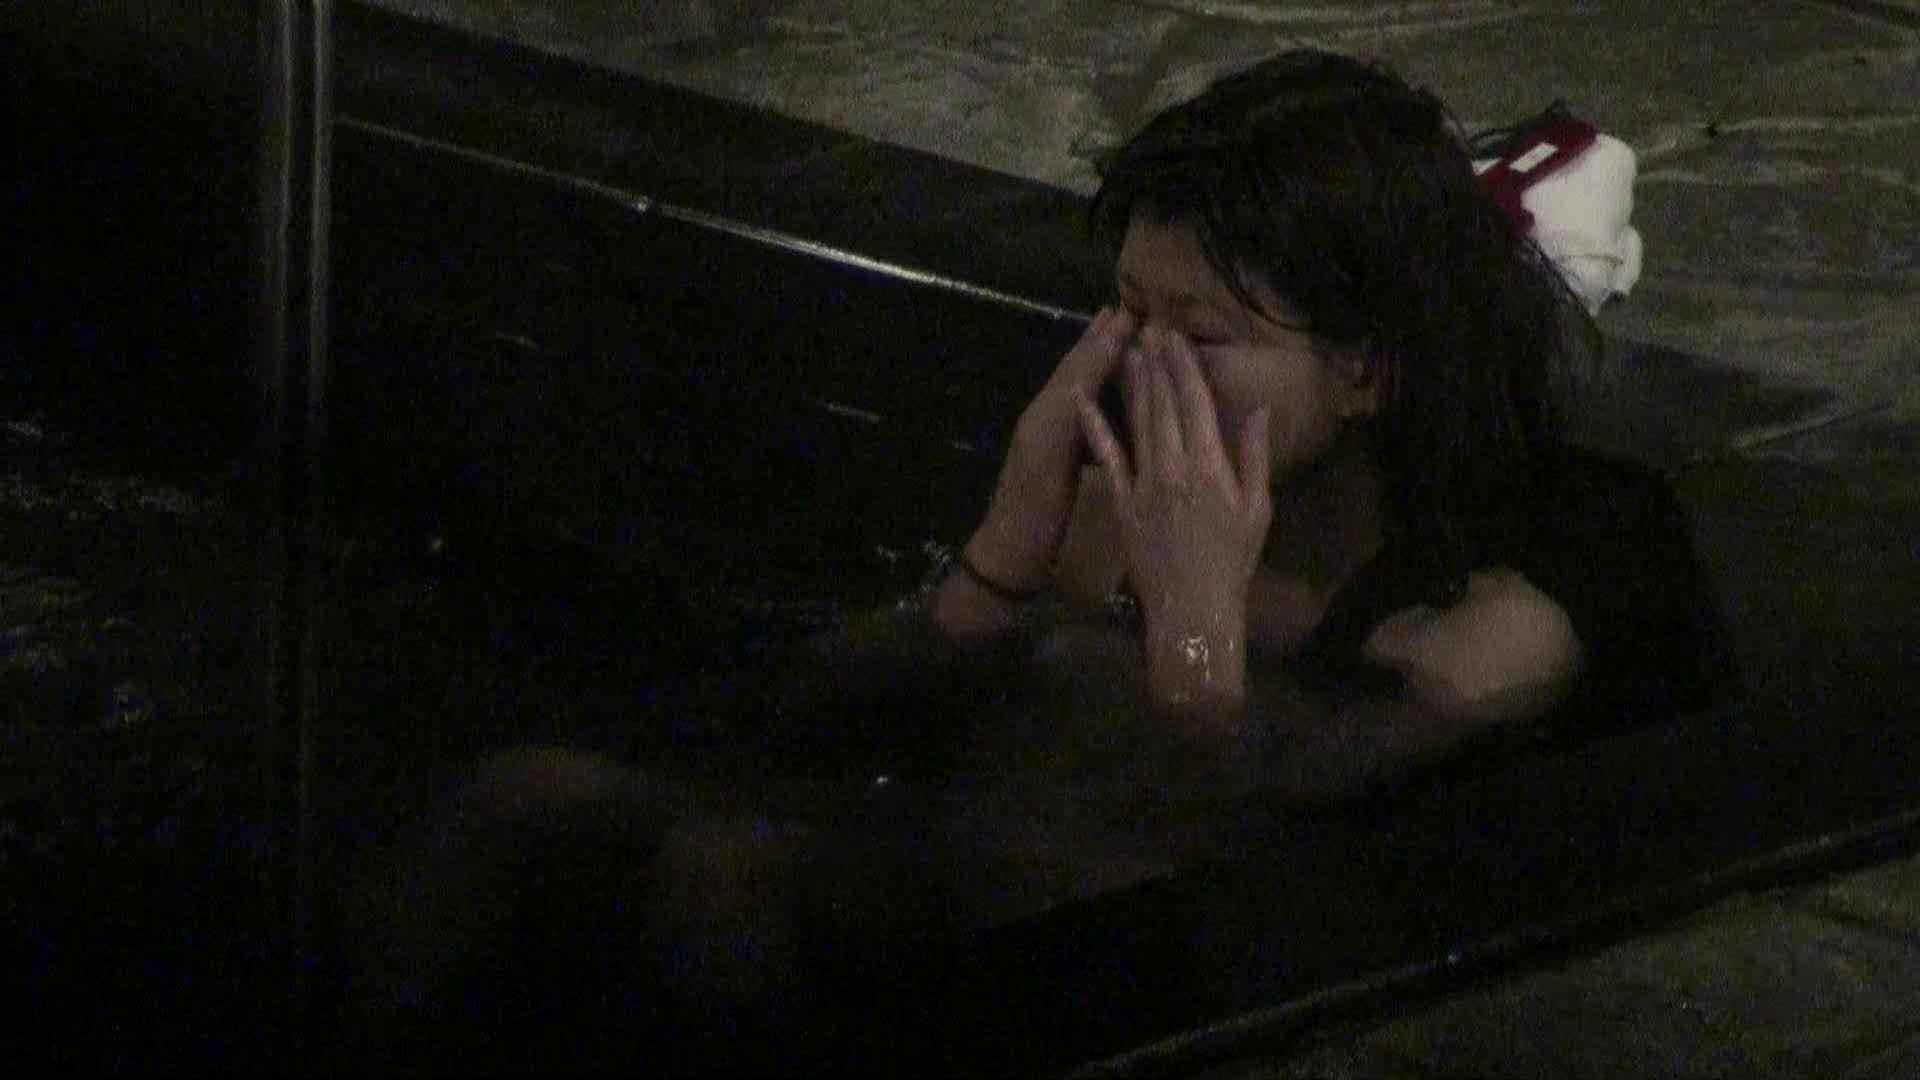 Aquaな露天風呂Vol.371 露天 スケベ動画紹介 94枚 11